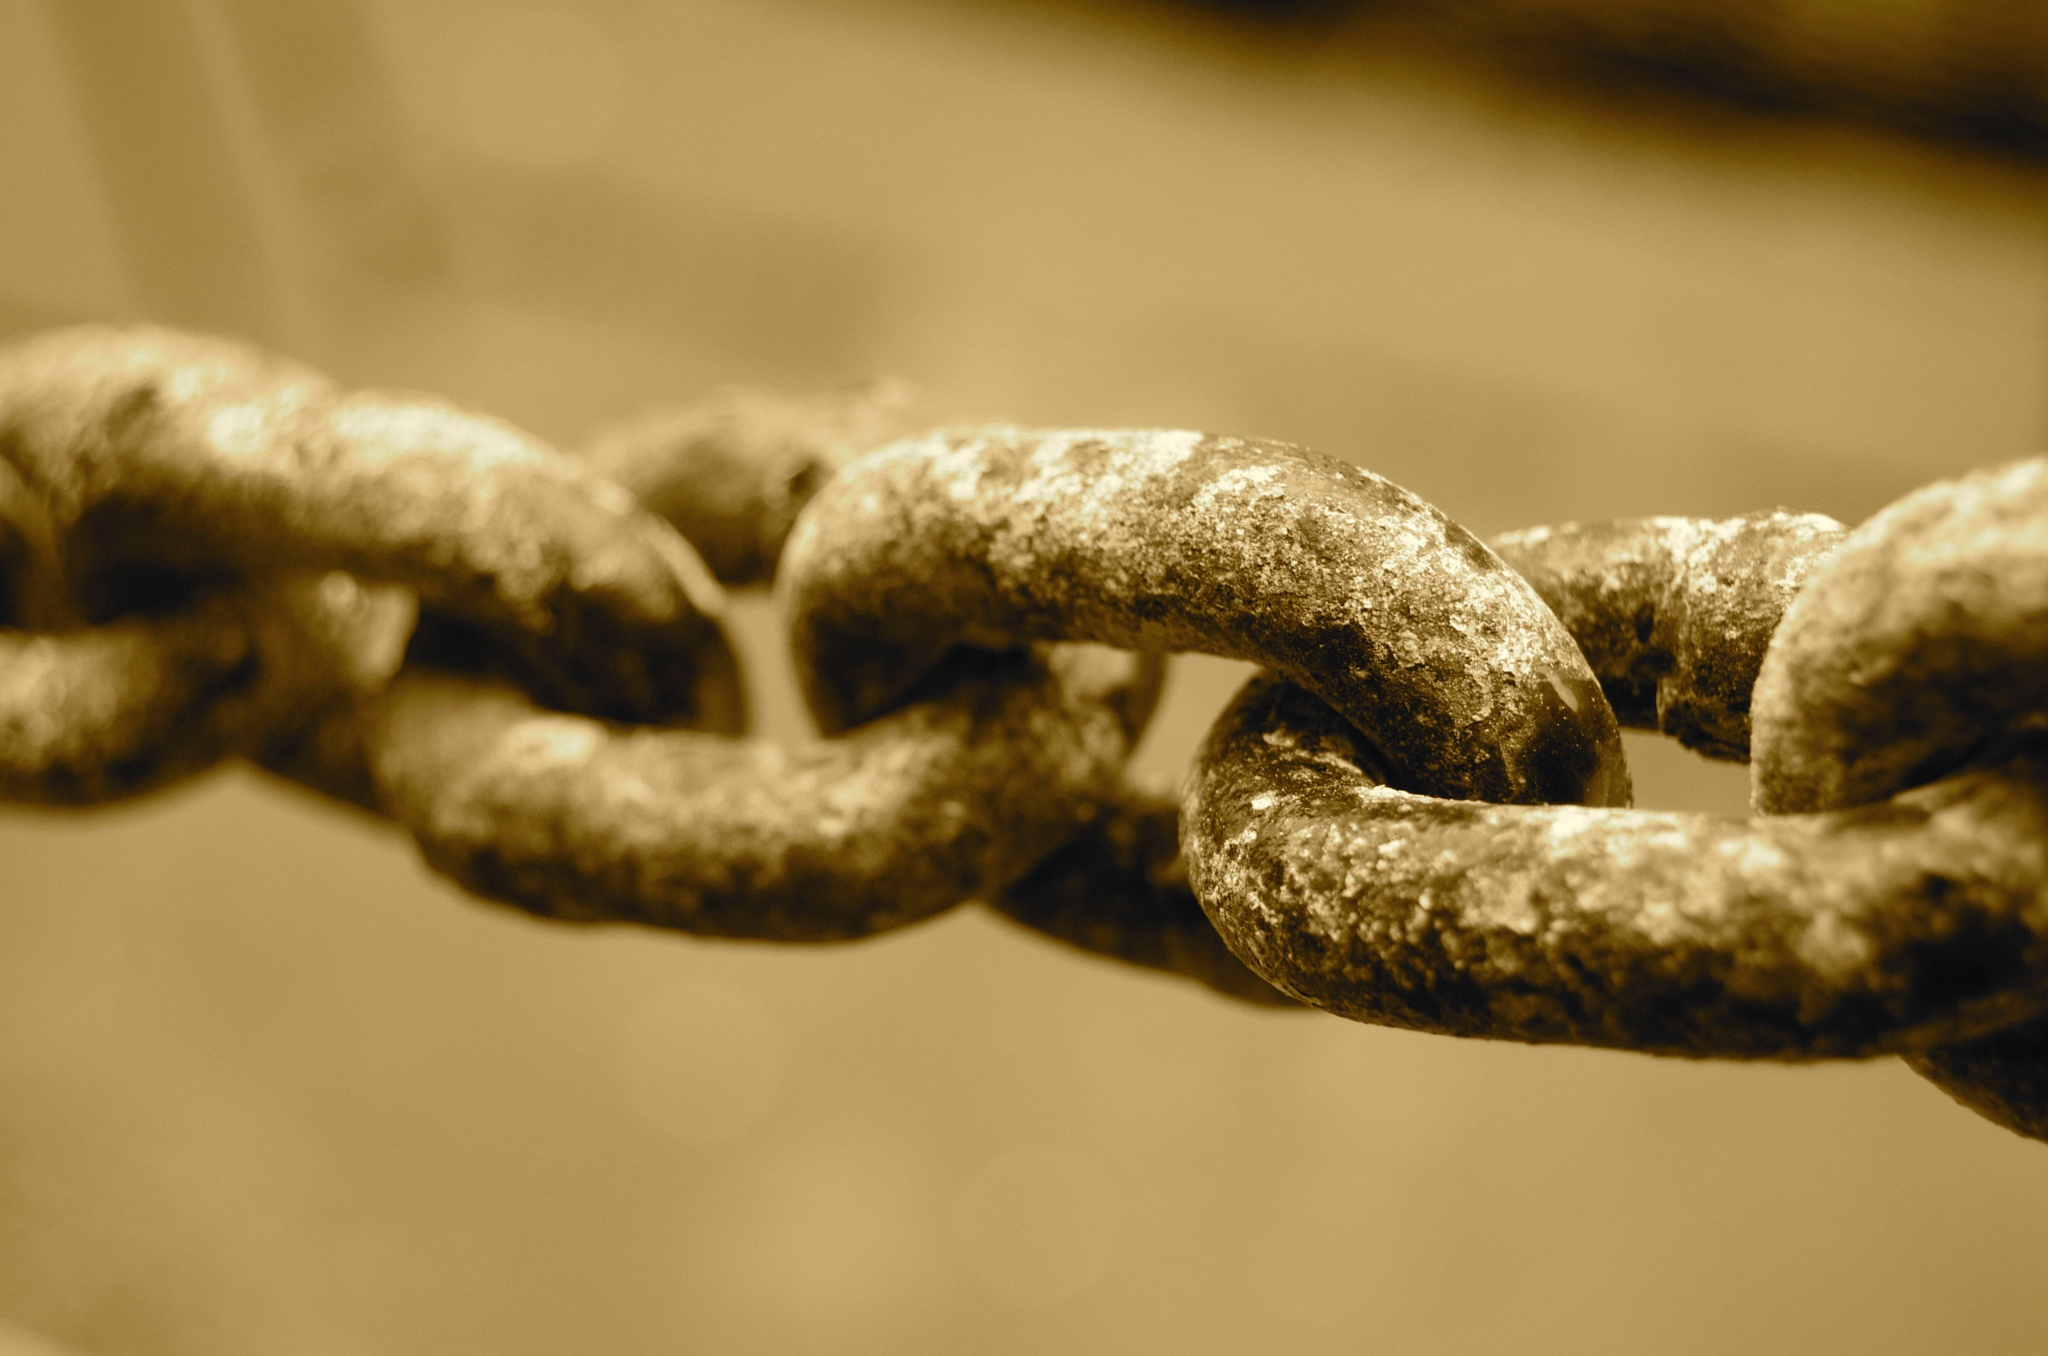 Rusted chain by Lars-Toralf Utnes Storstrand